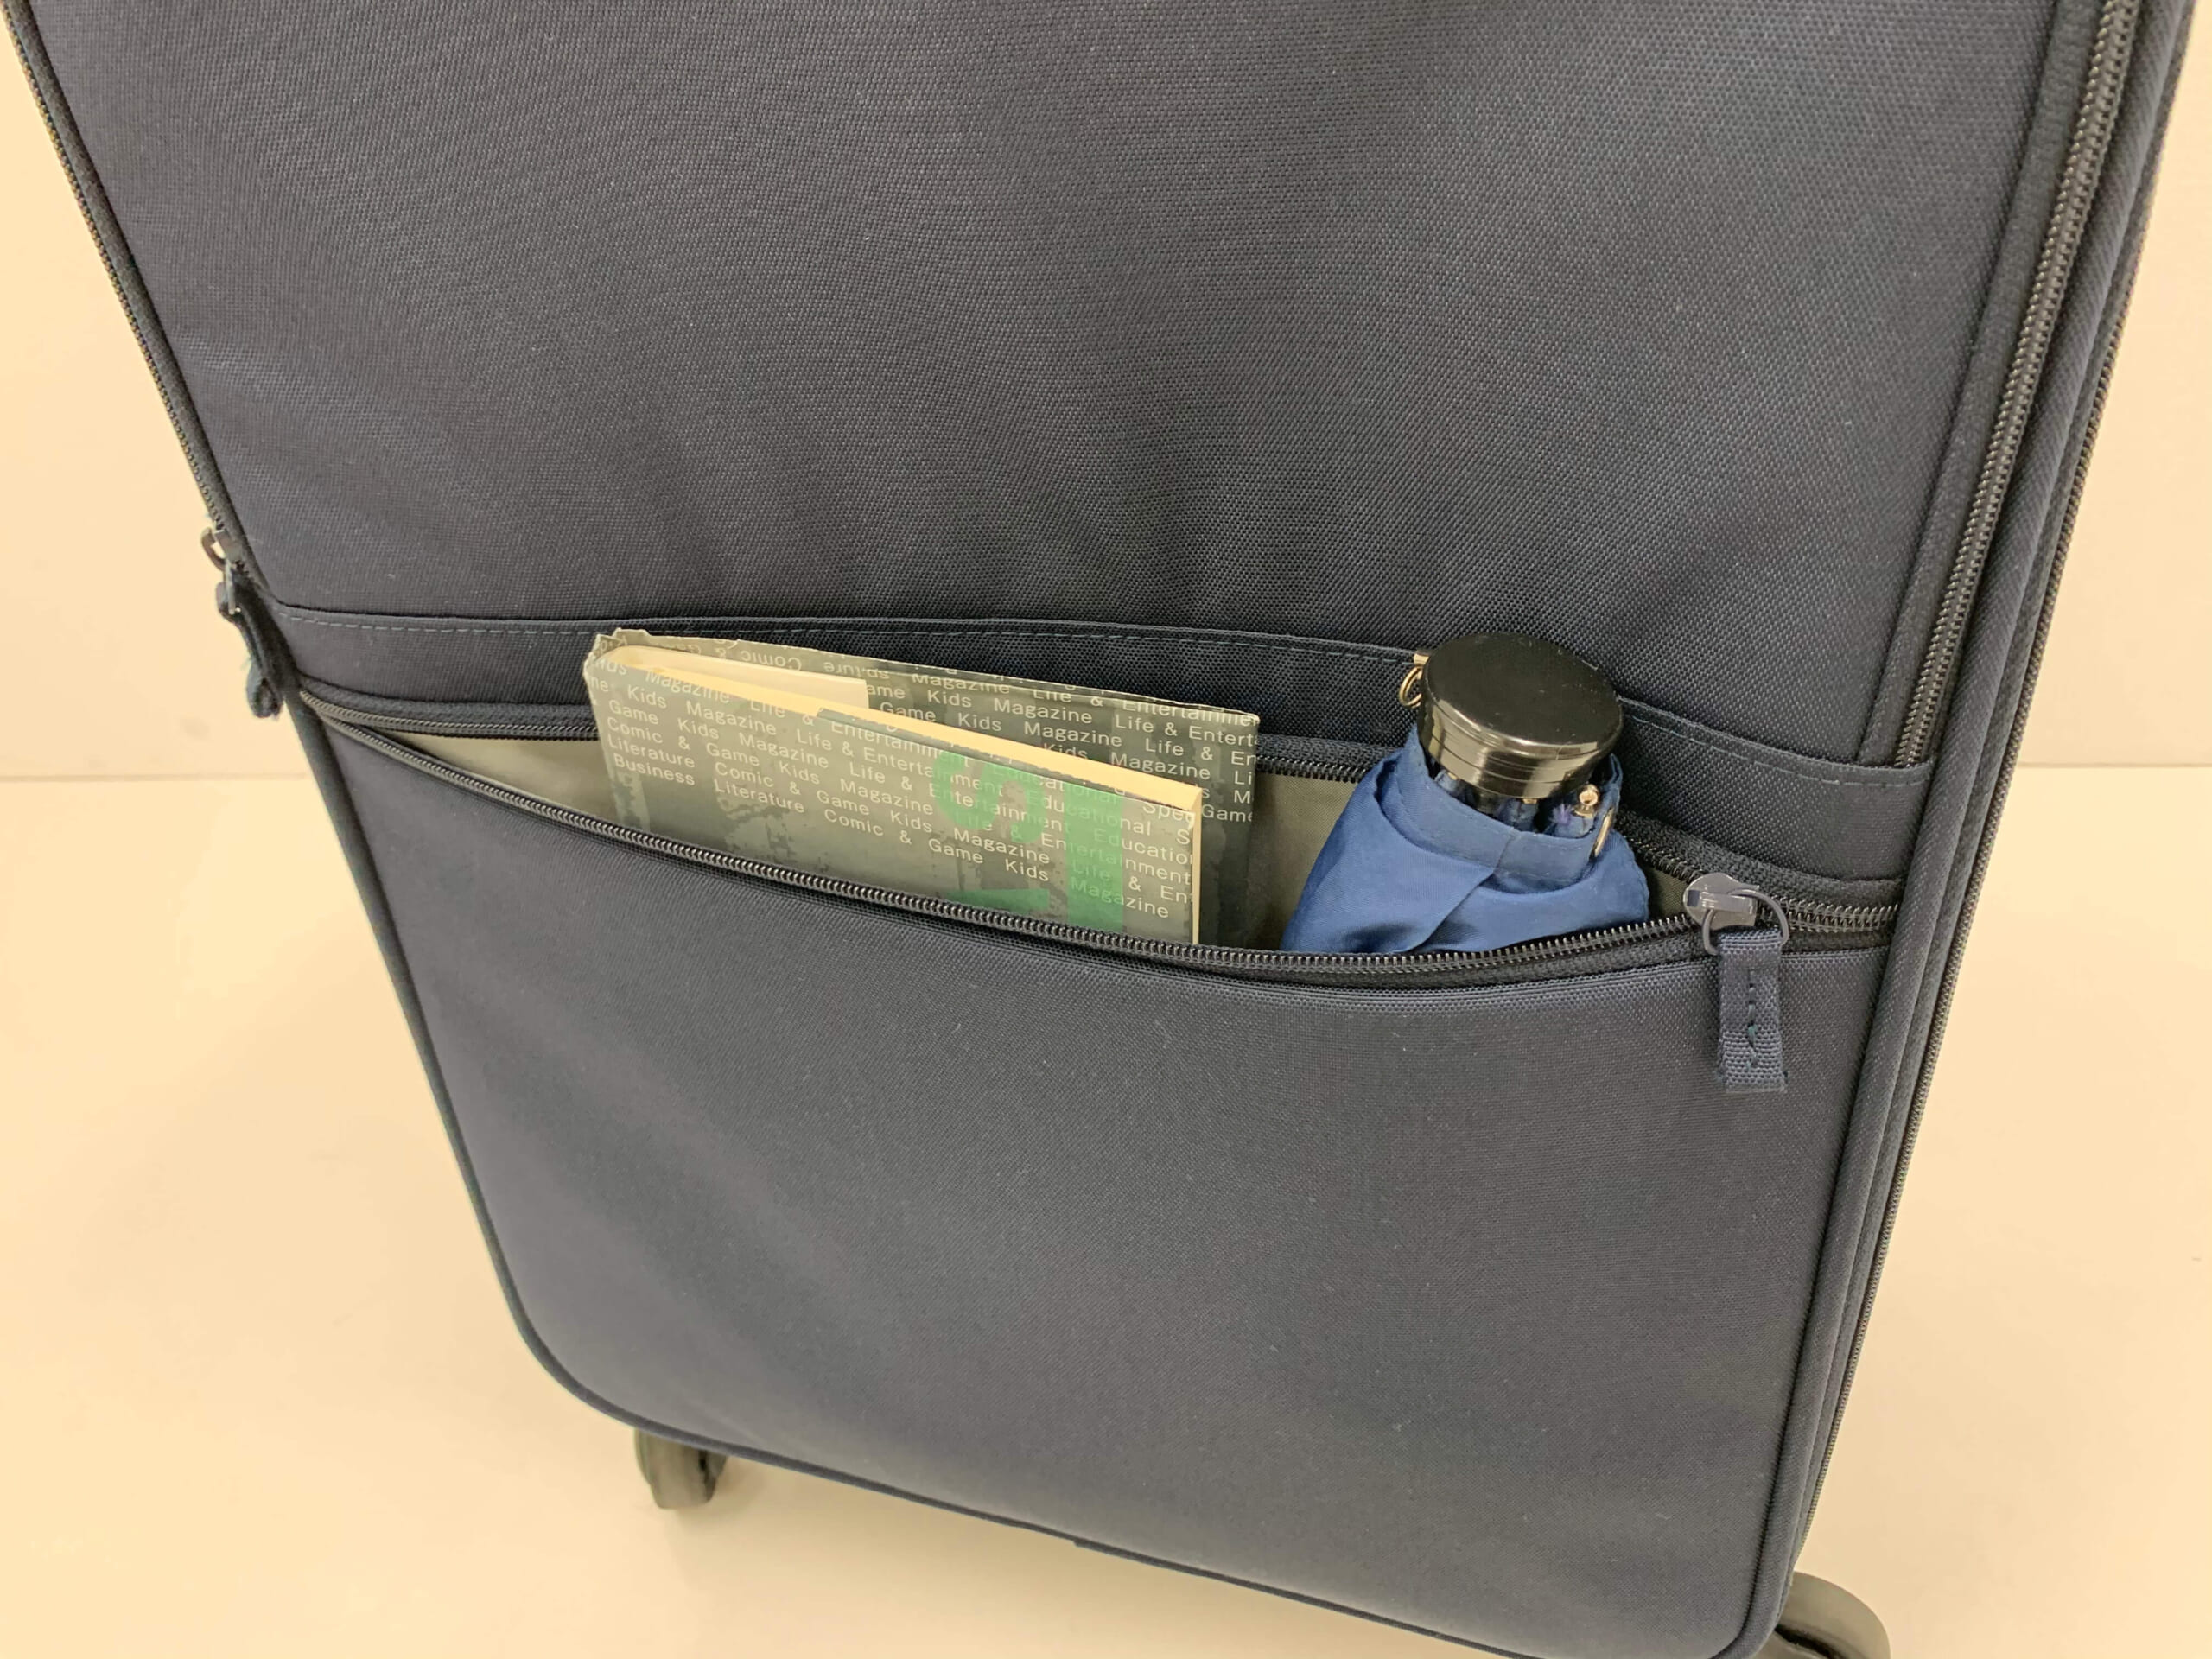 PCや書類、小物の収納に便利なフロントポケット(外側下ポケット)